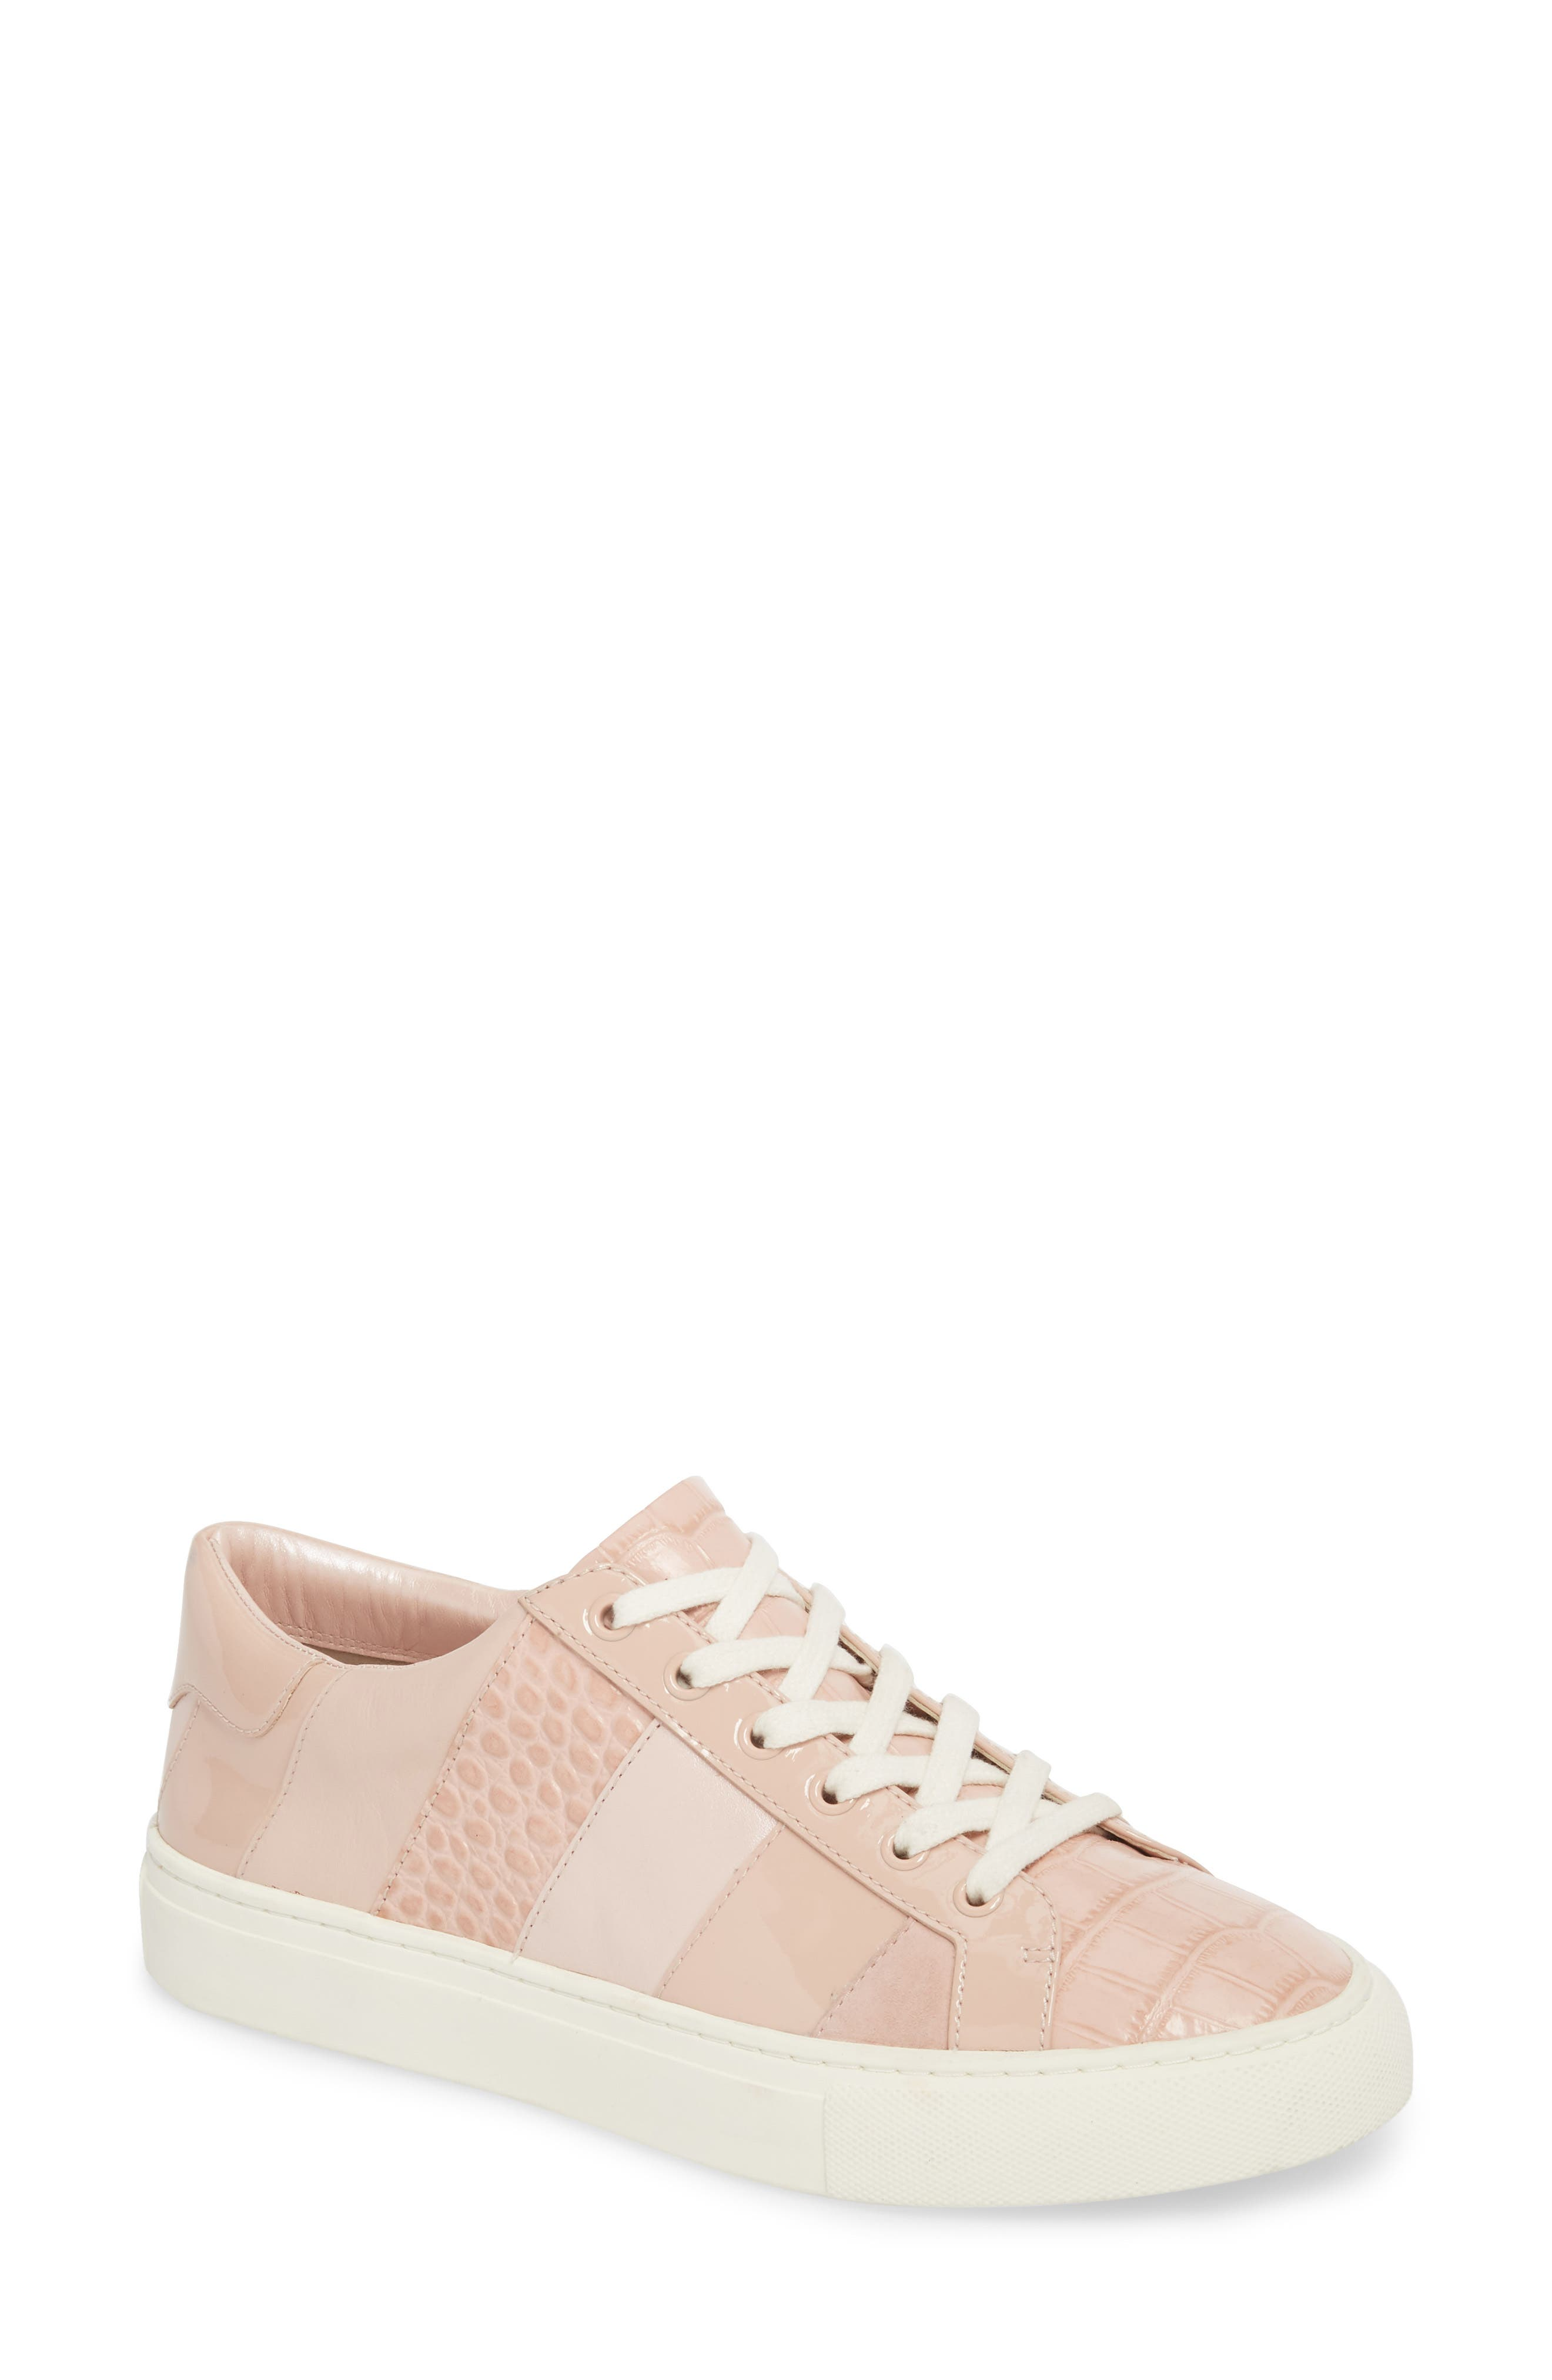 Ames Sneaker,                             Main thumbnail 1, color,                             Sea Shell Pink/ Sea Shell Pink